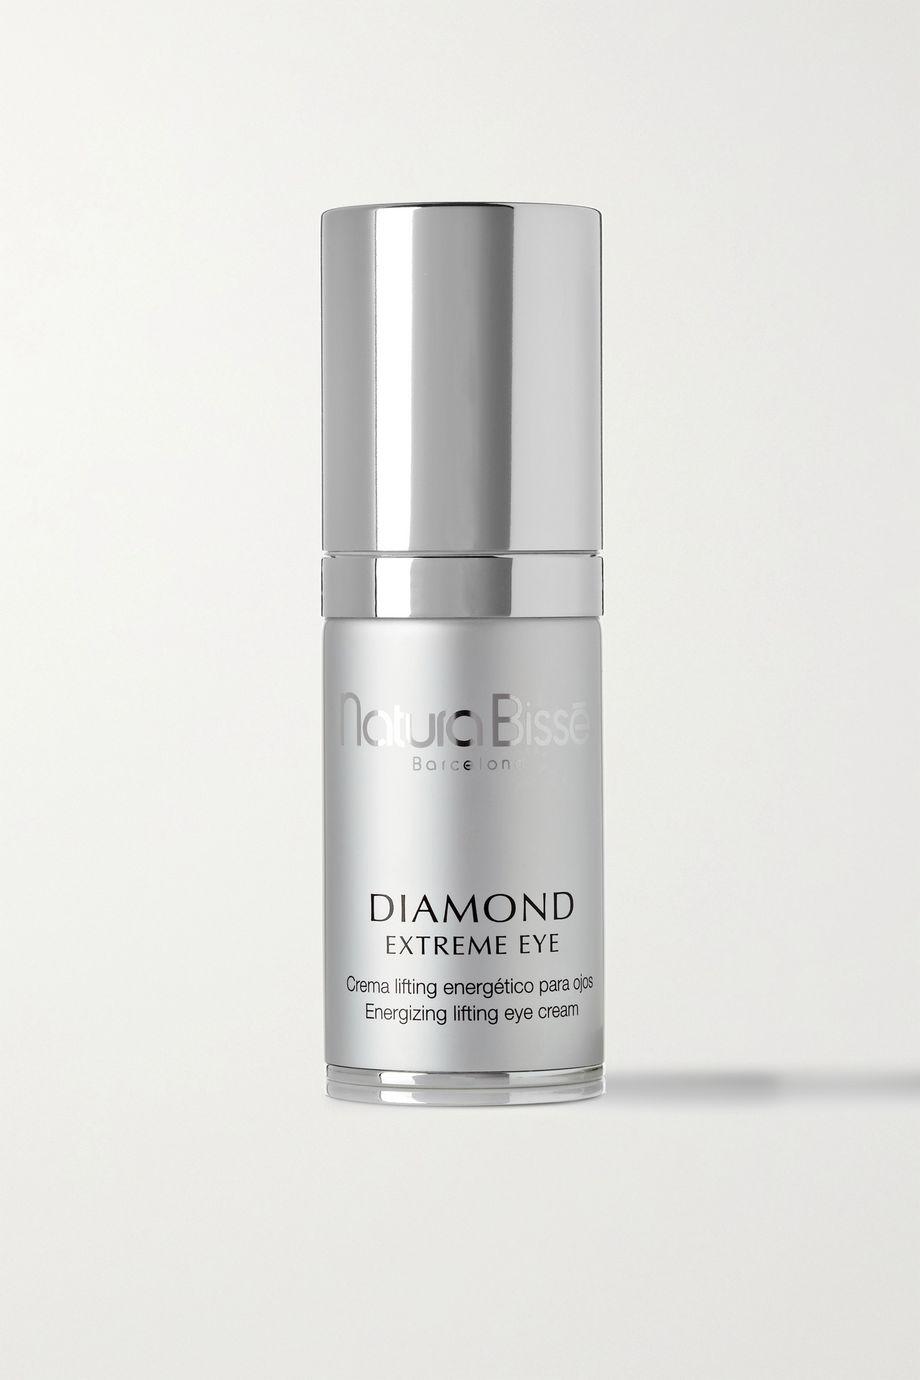 Natura Bissé Diamond Extreme Eye, 25ml – Augencreme